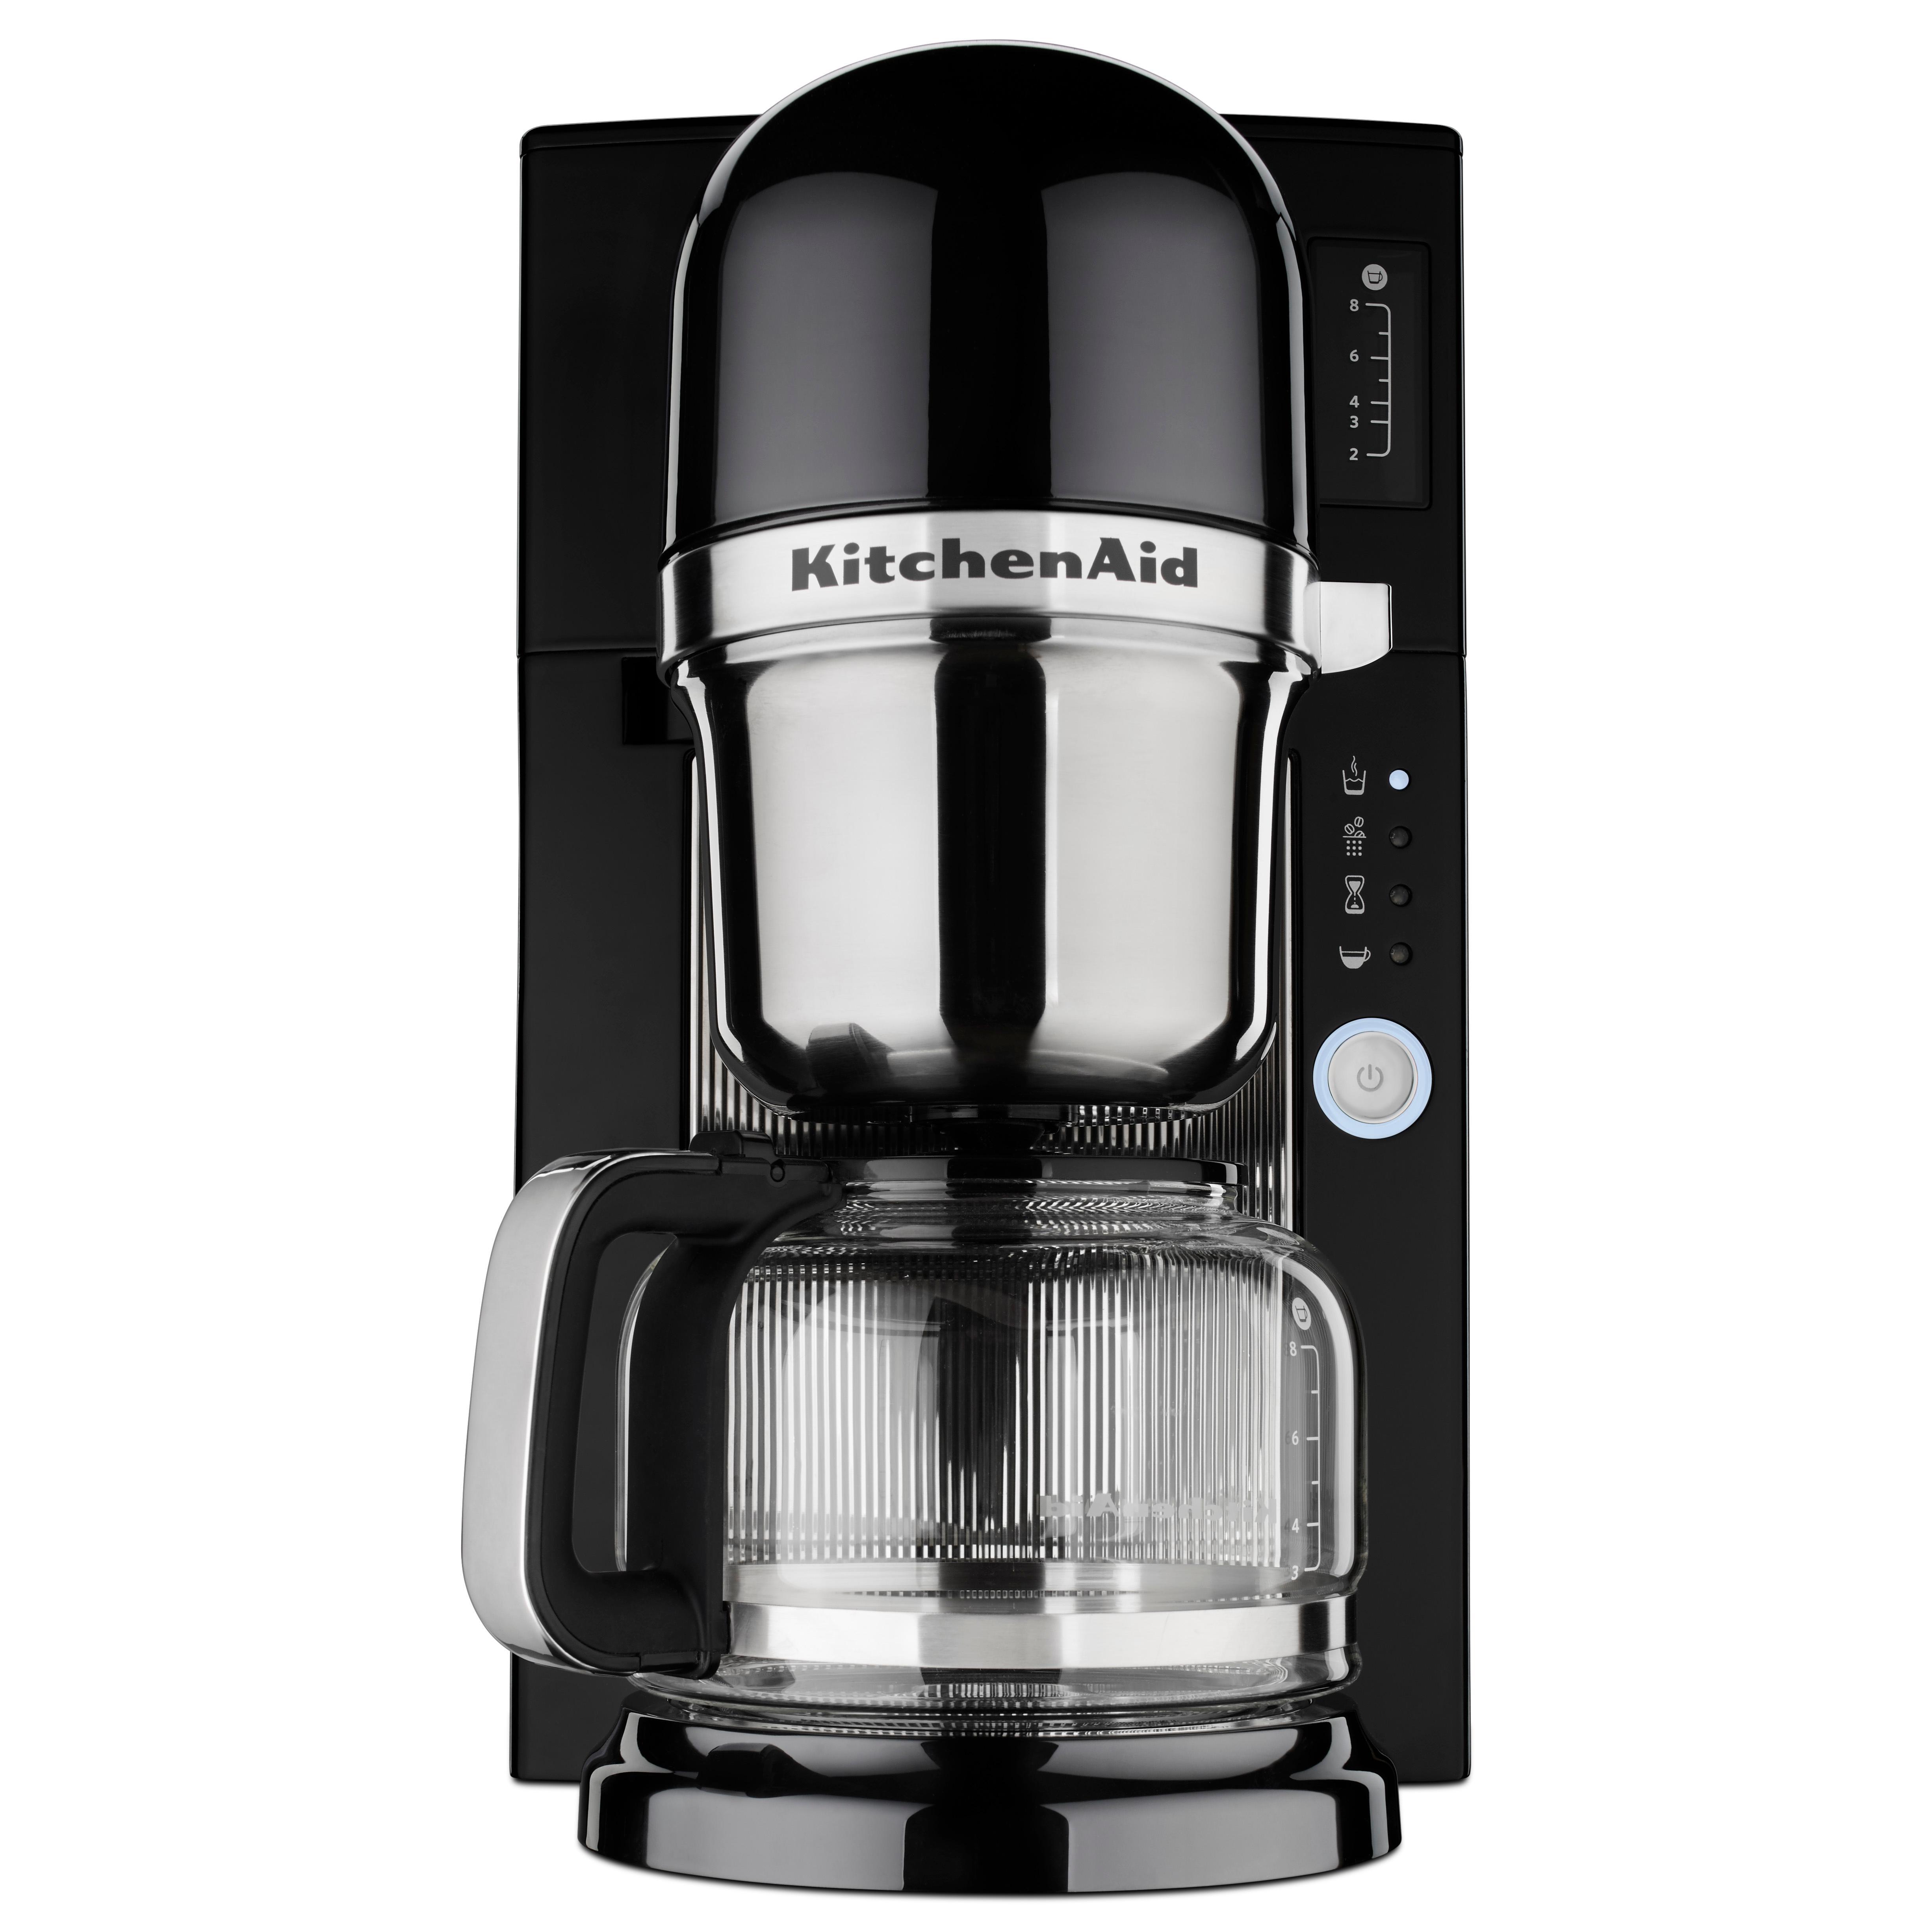 Kitchenaid Kcm0801ob Pour Over Coffee Brewer Onyx Black